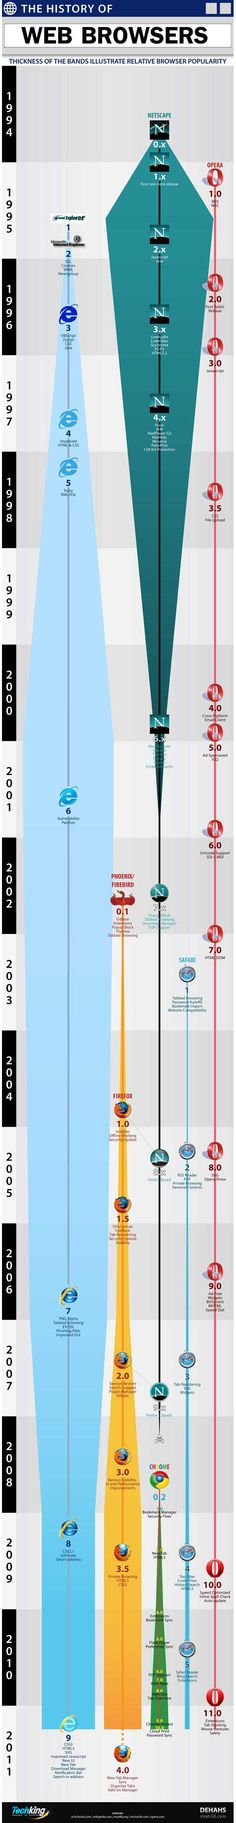 The History of Web Browsers #firefox #opera #netscape #explorer